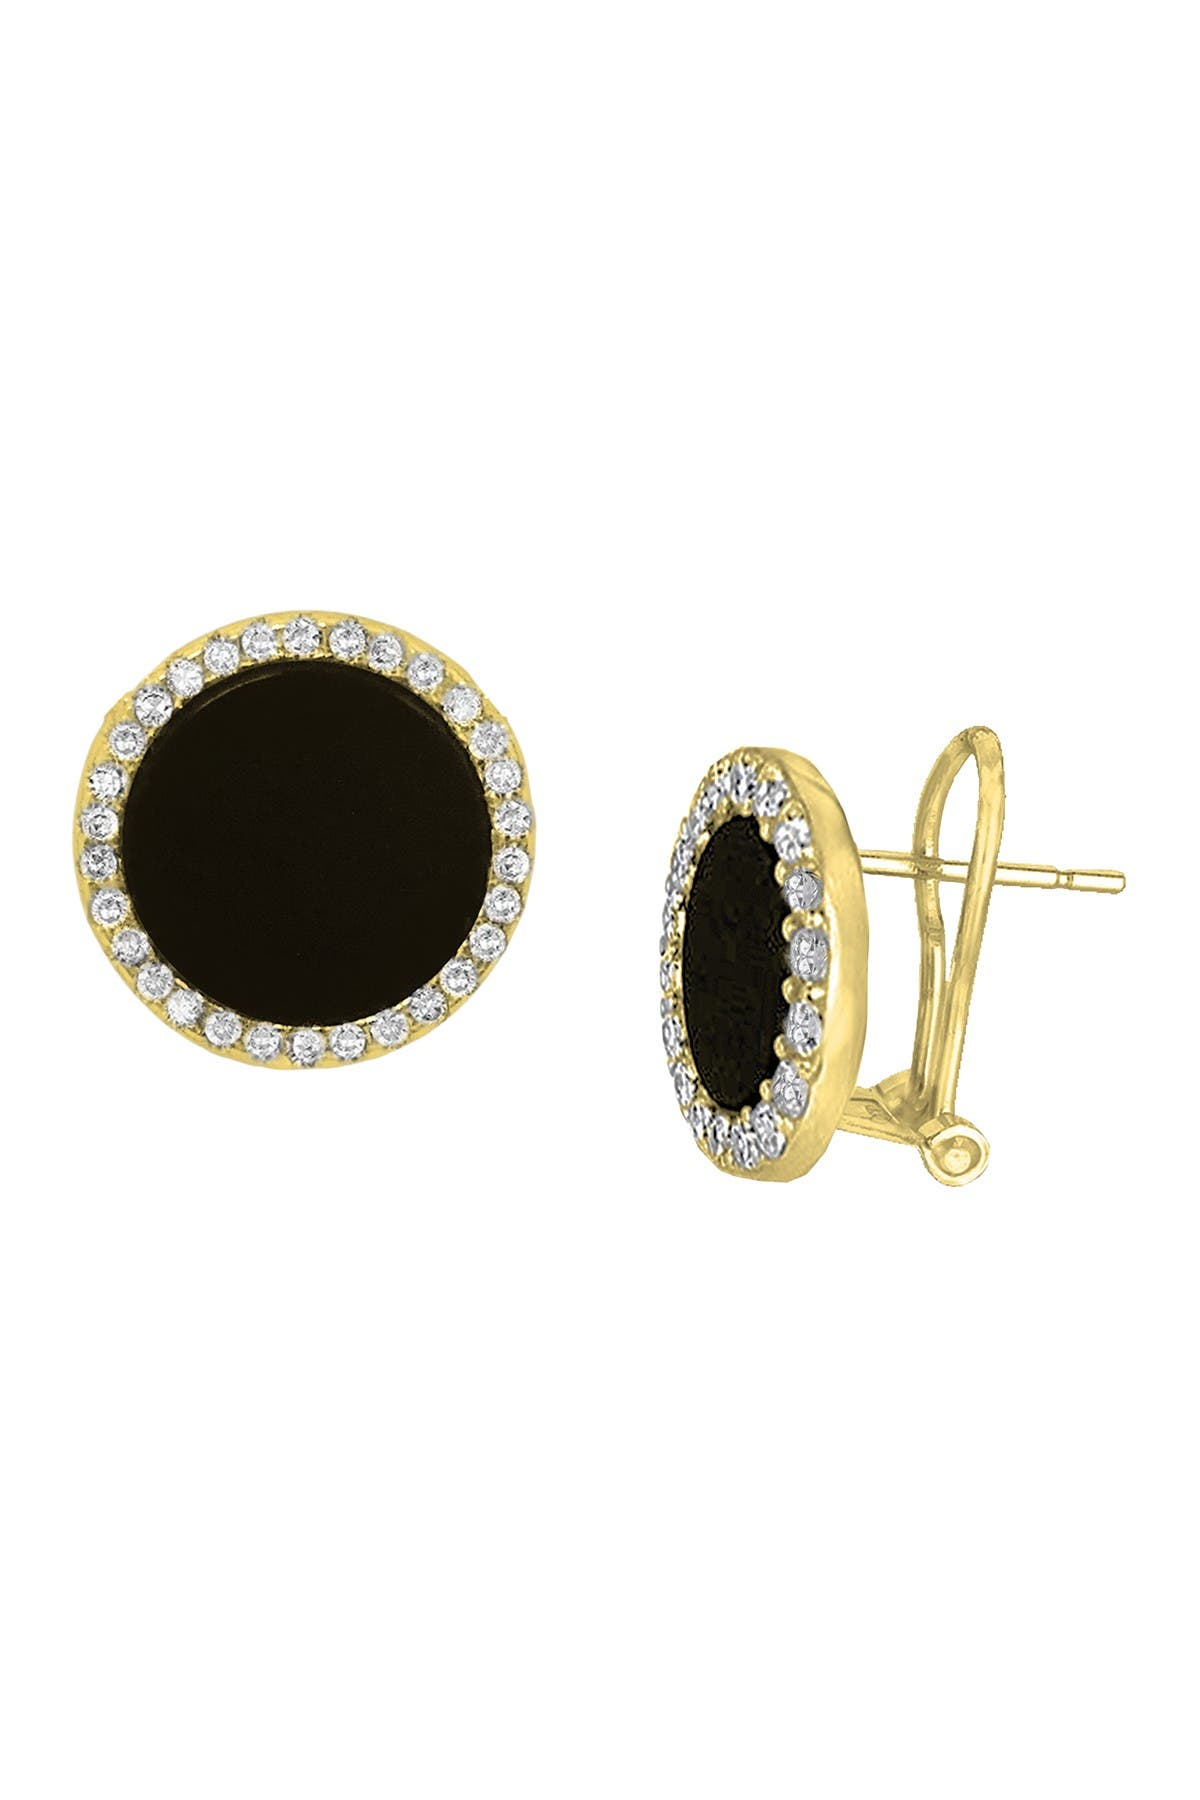 Image of Savvy Cie 18K Gold Vermeil Black Onyx Halo Omega Back Earrings